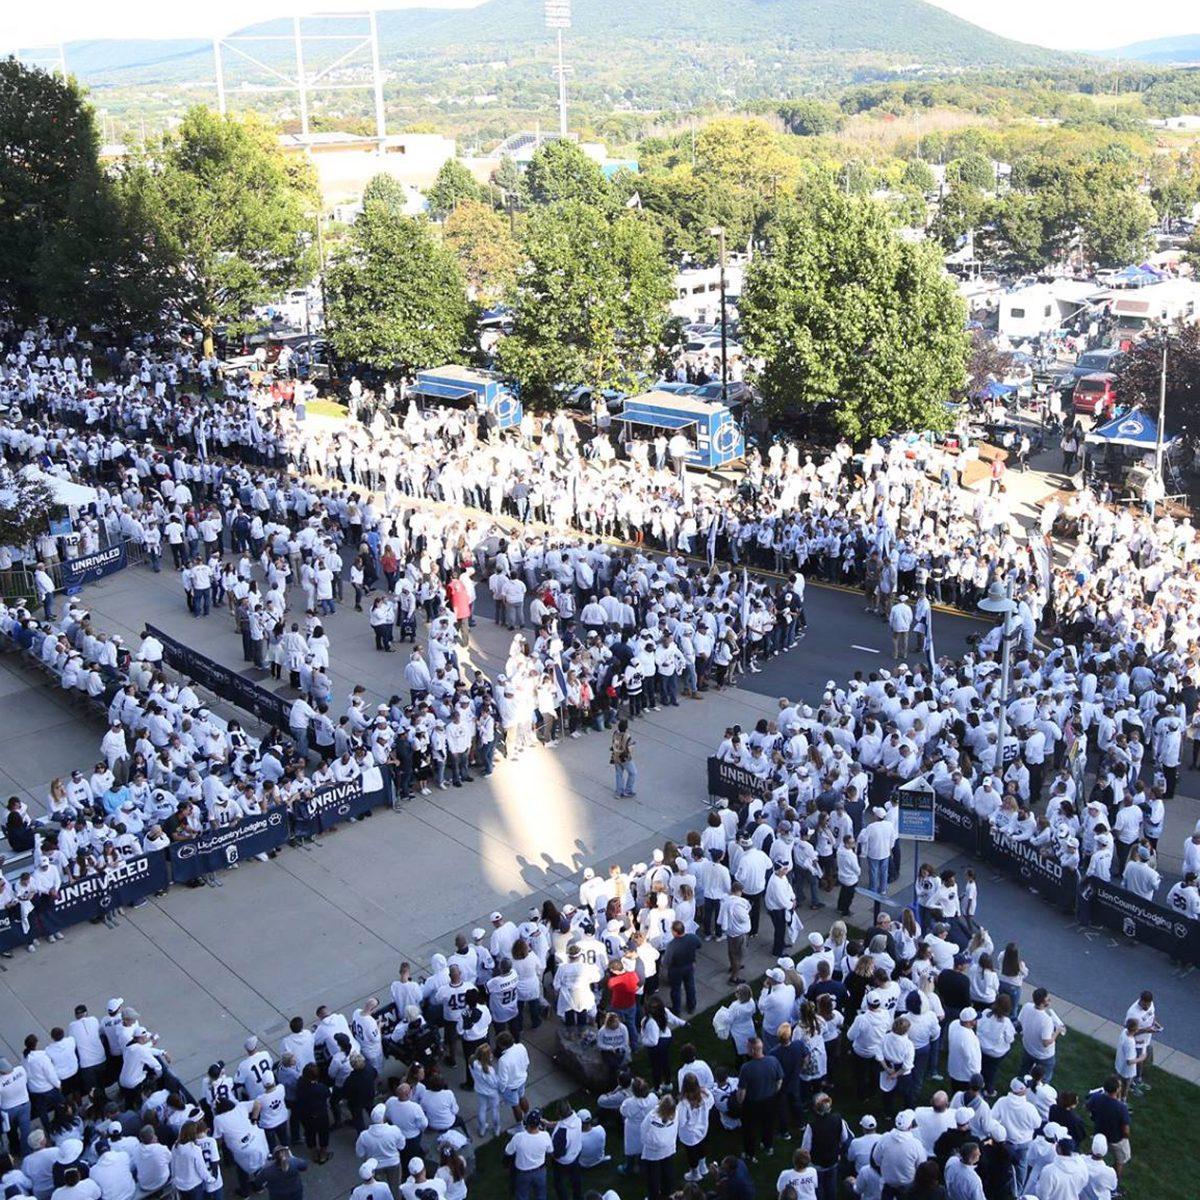 Penn State Football fans line the street